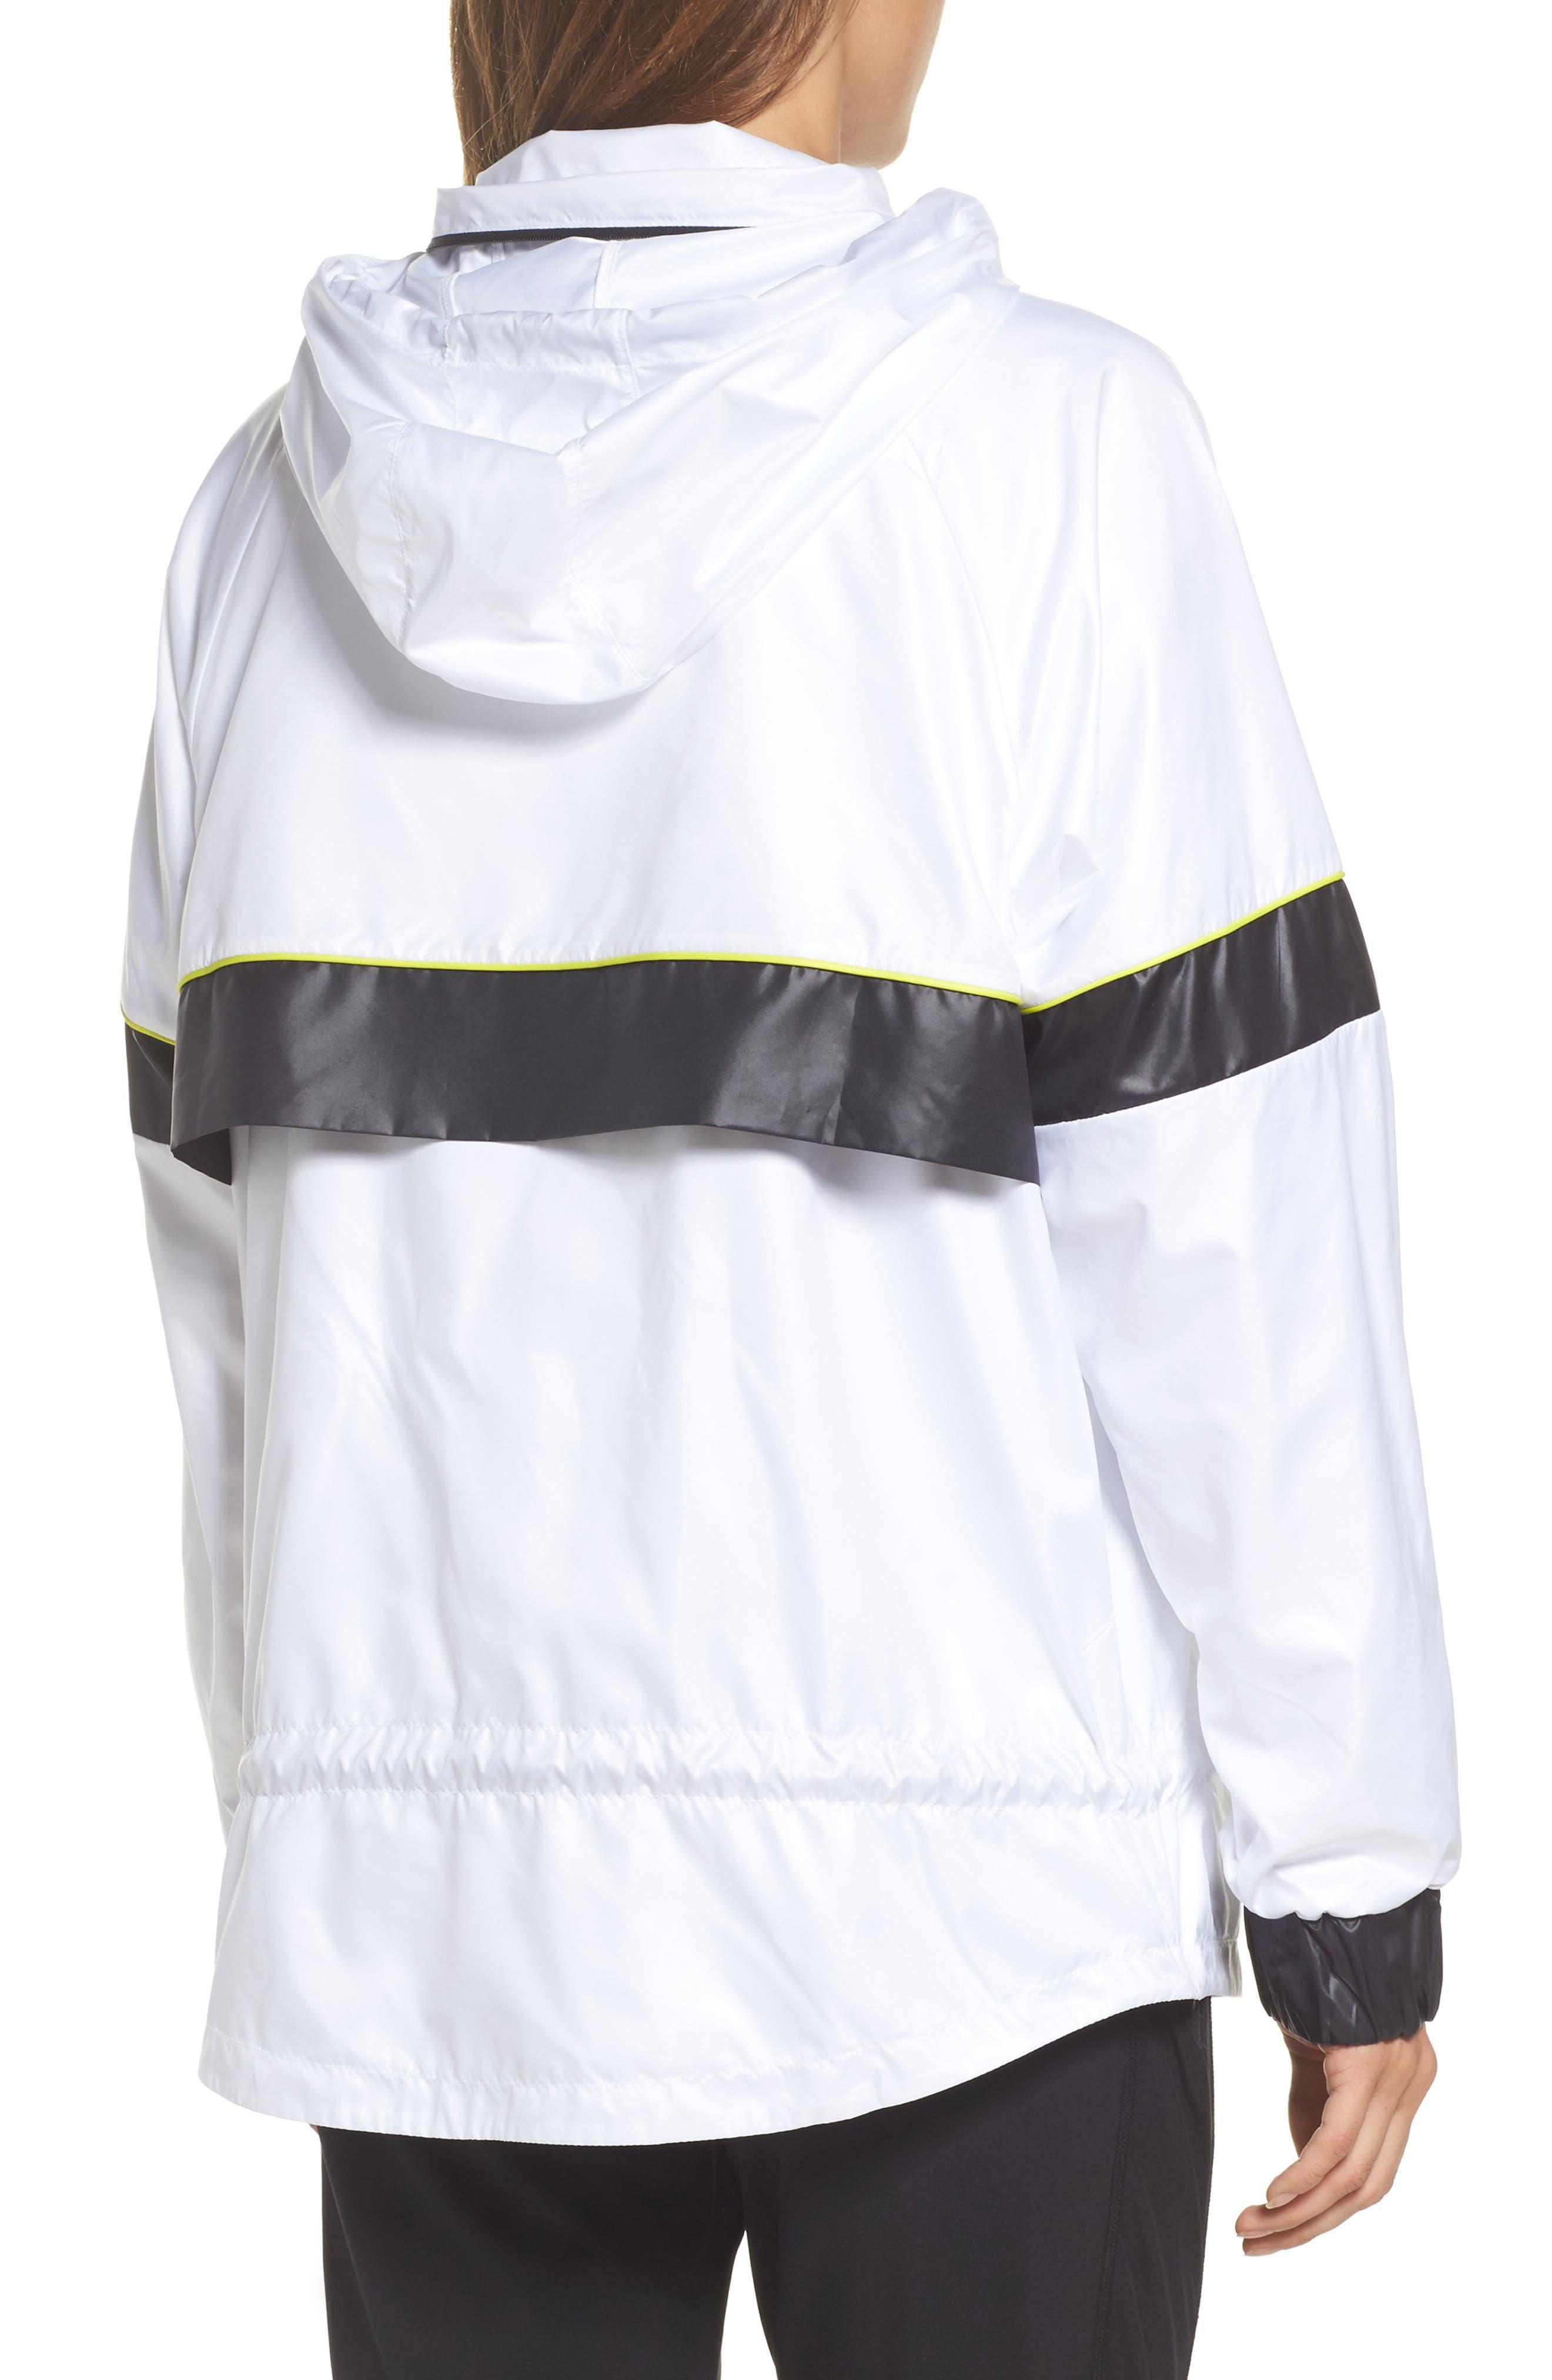 Shadowboxer Jacket,                             Alternate thumbnail 2, color,                             100